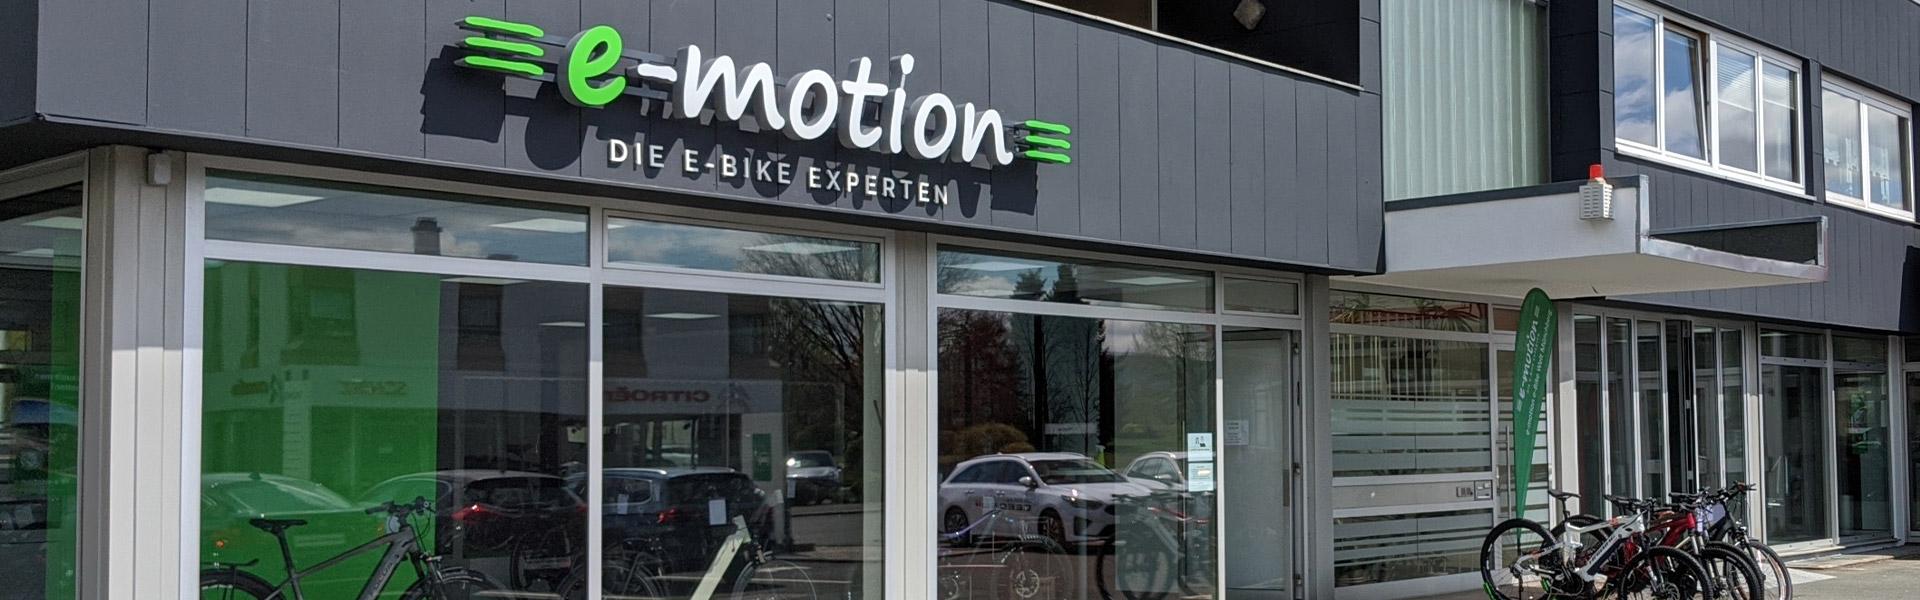 Der Shop der e-motion e-Bike Welt Münchberg